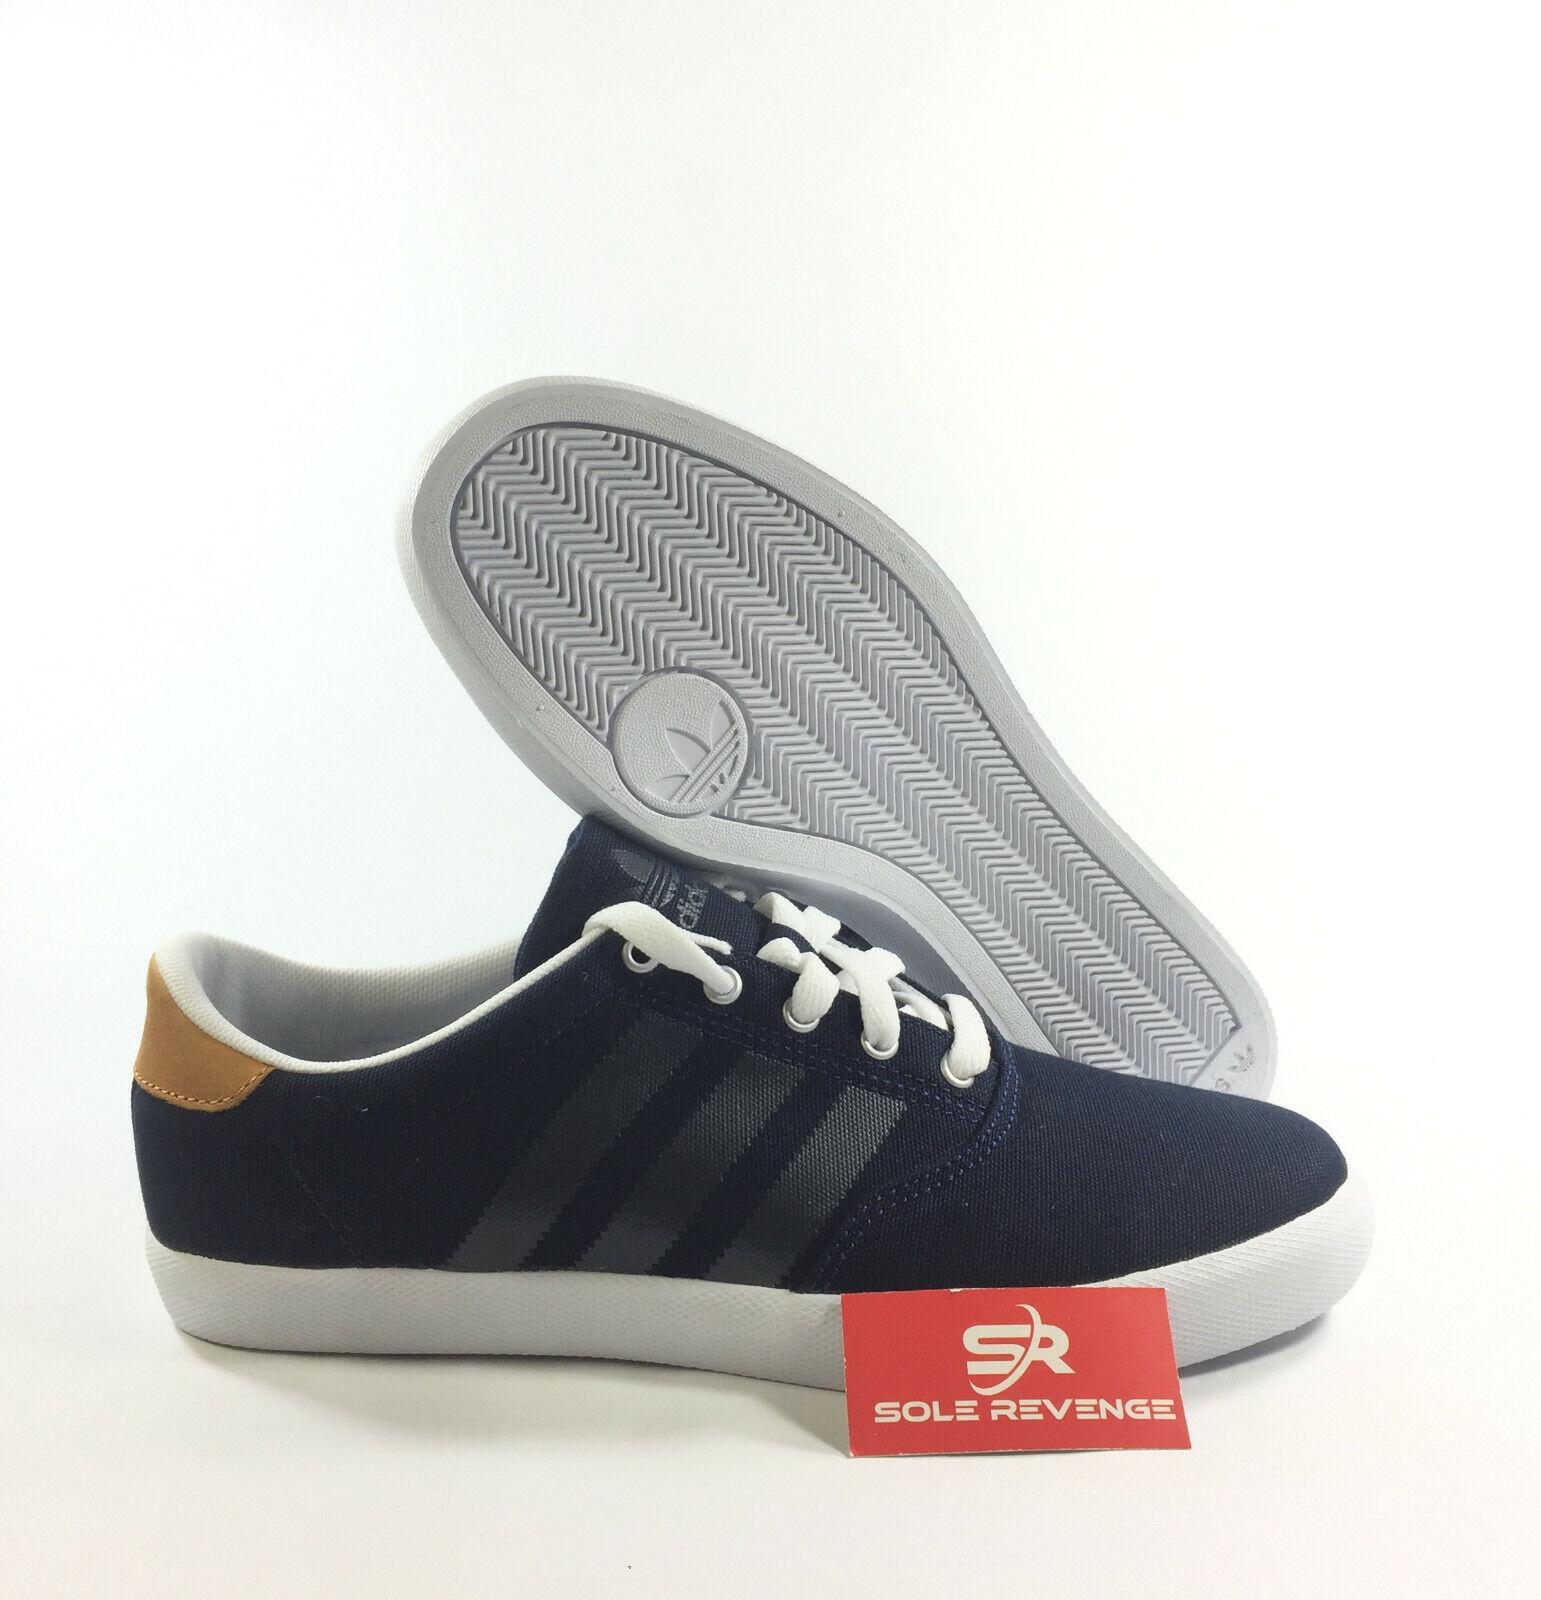 8 adidas Originals adi M.C. Low G65903 Dark Indigo blueE White Brown Casual shoes